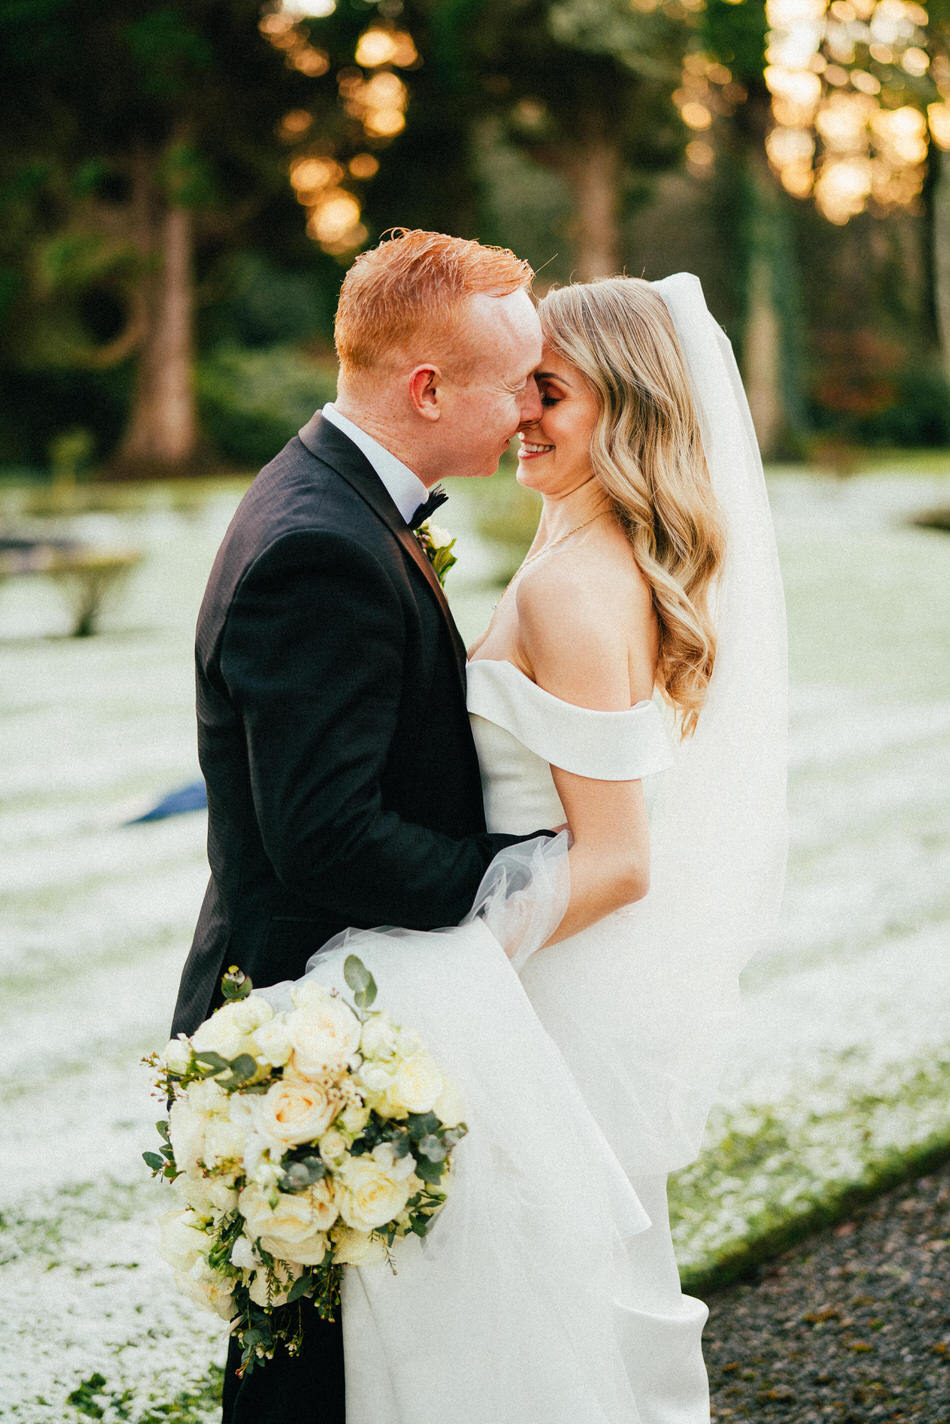 Castle-wedding-ireland-photos- 0207 148